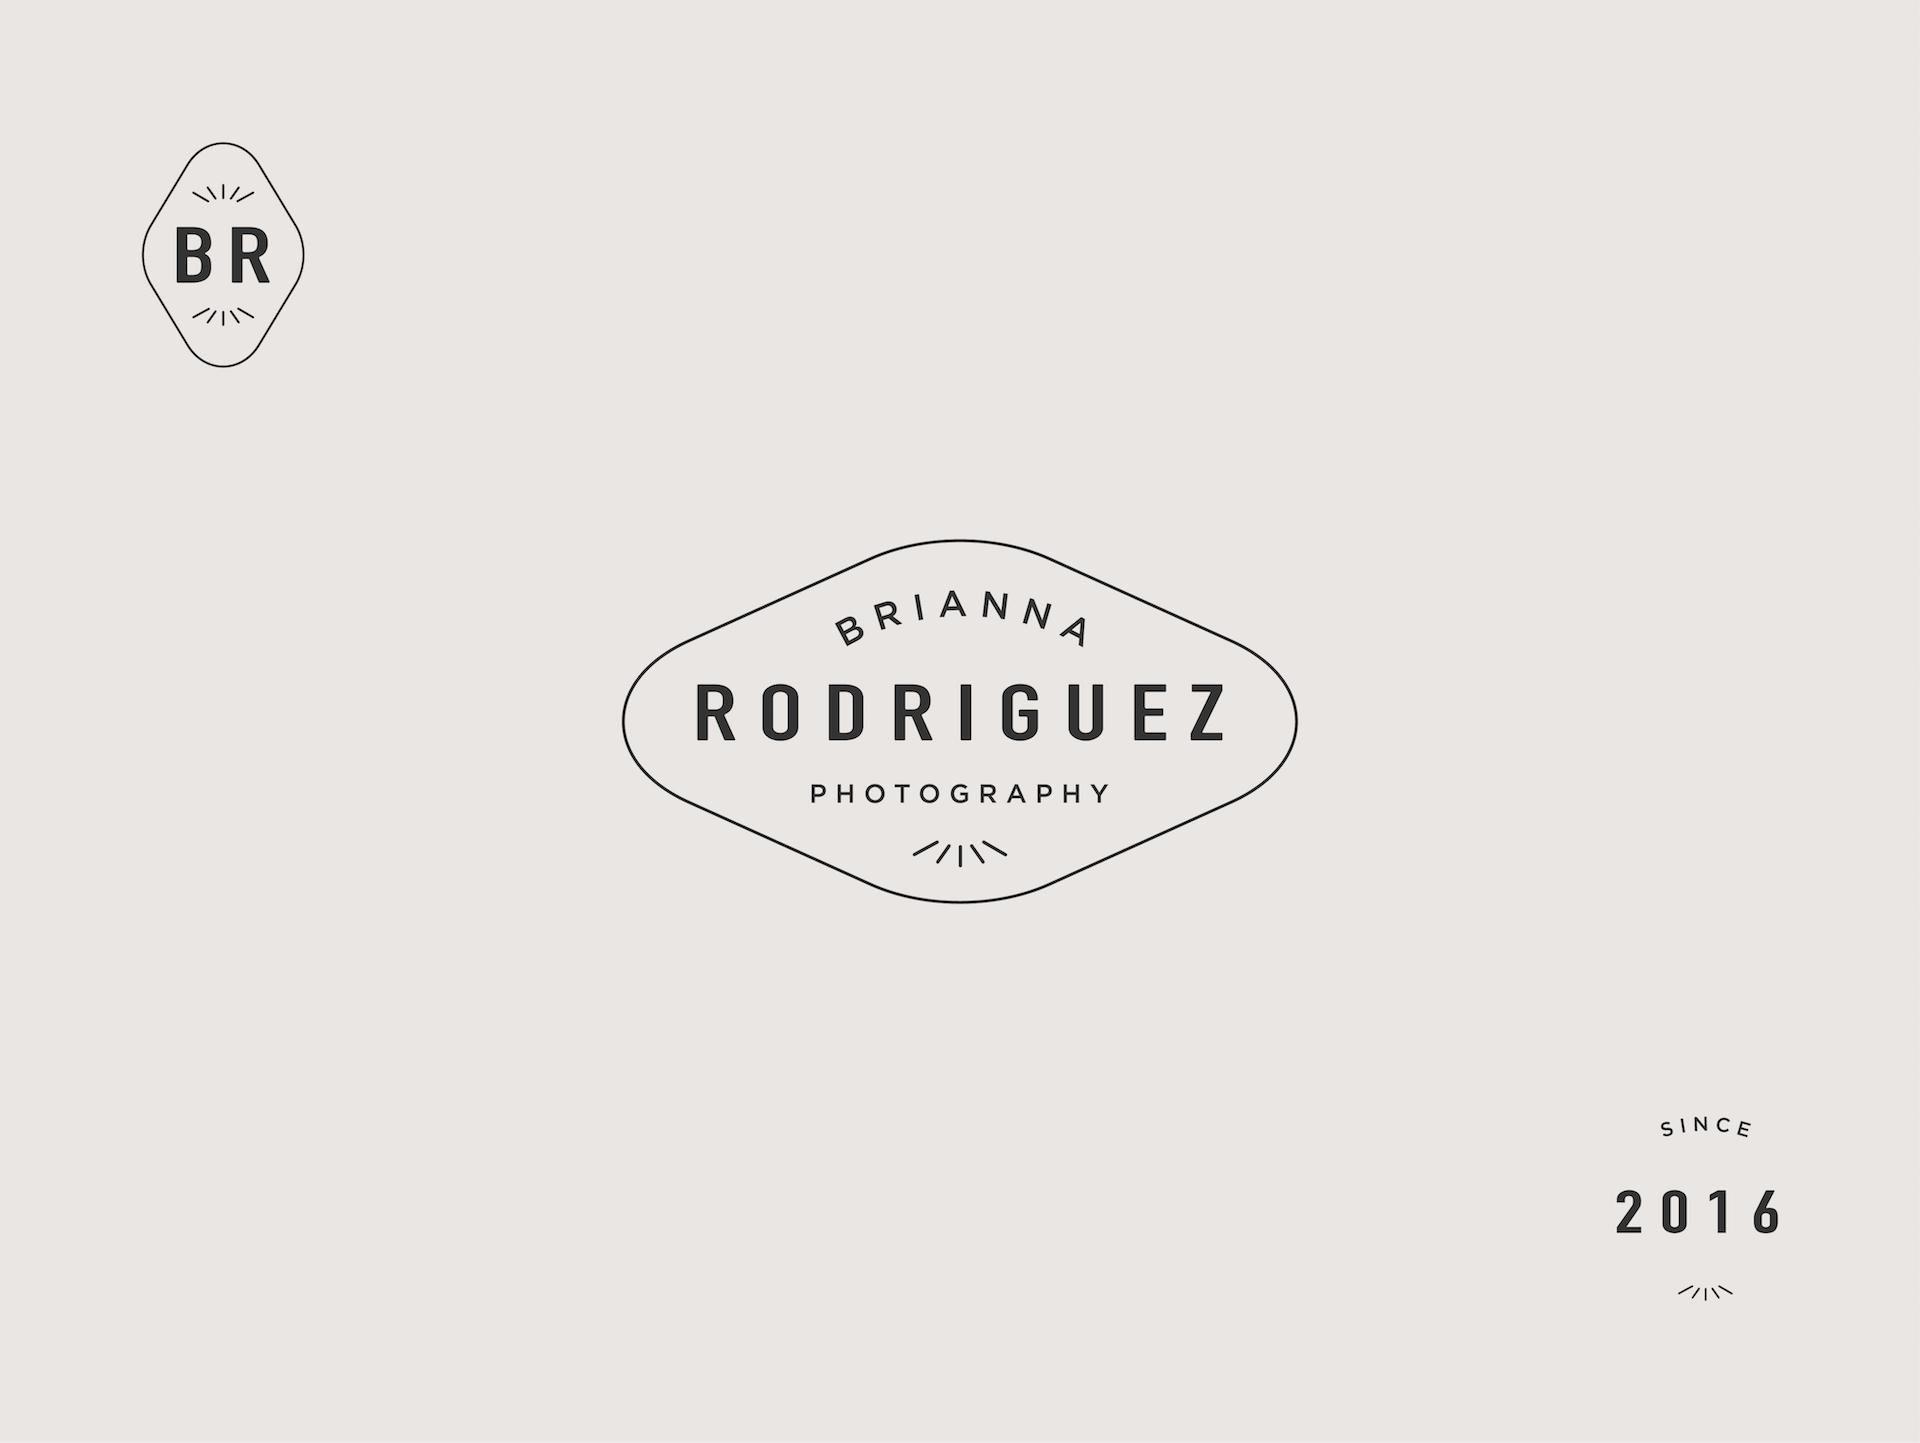 Brianna Rodriguez Photography - Branding Design